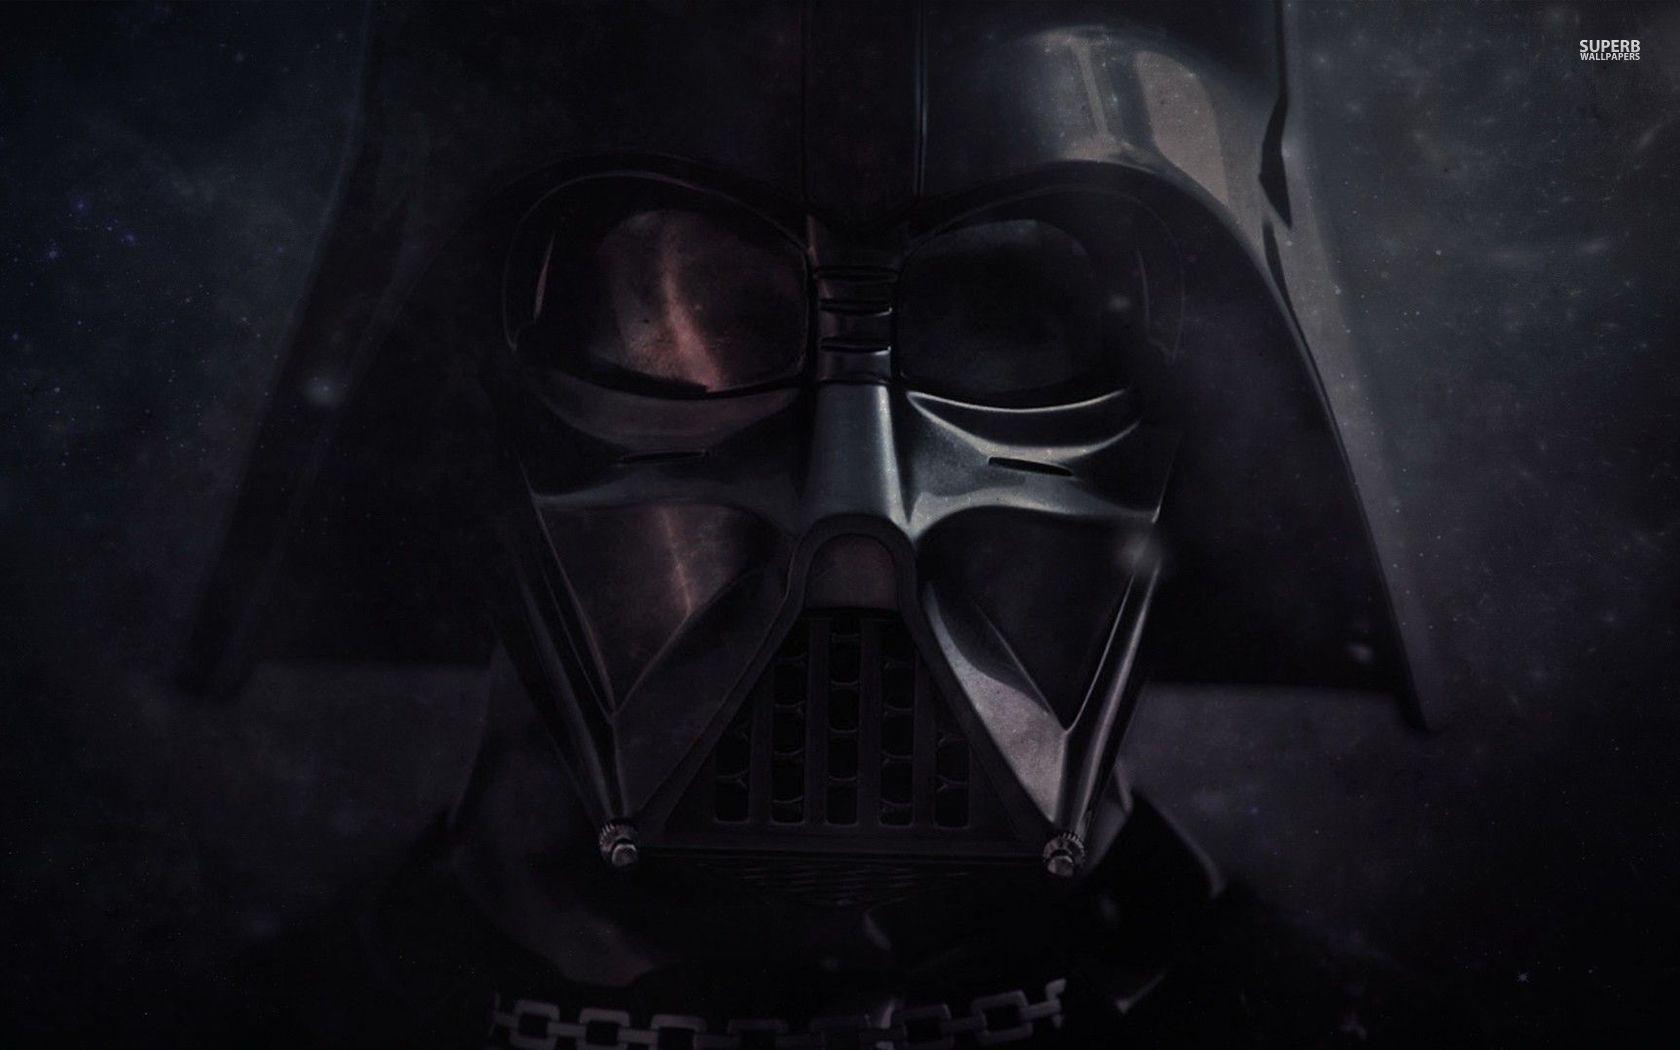 75 Darth Vader Wallpaper On Wallpapersafari